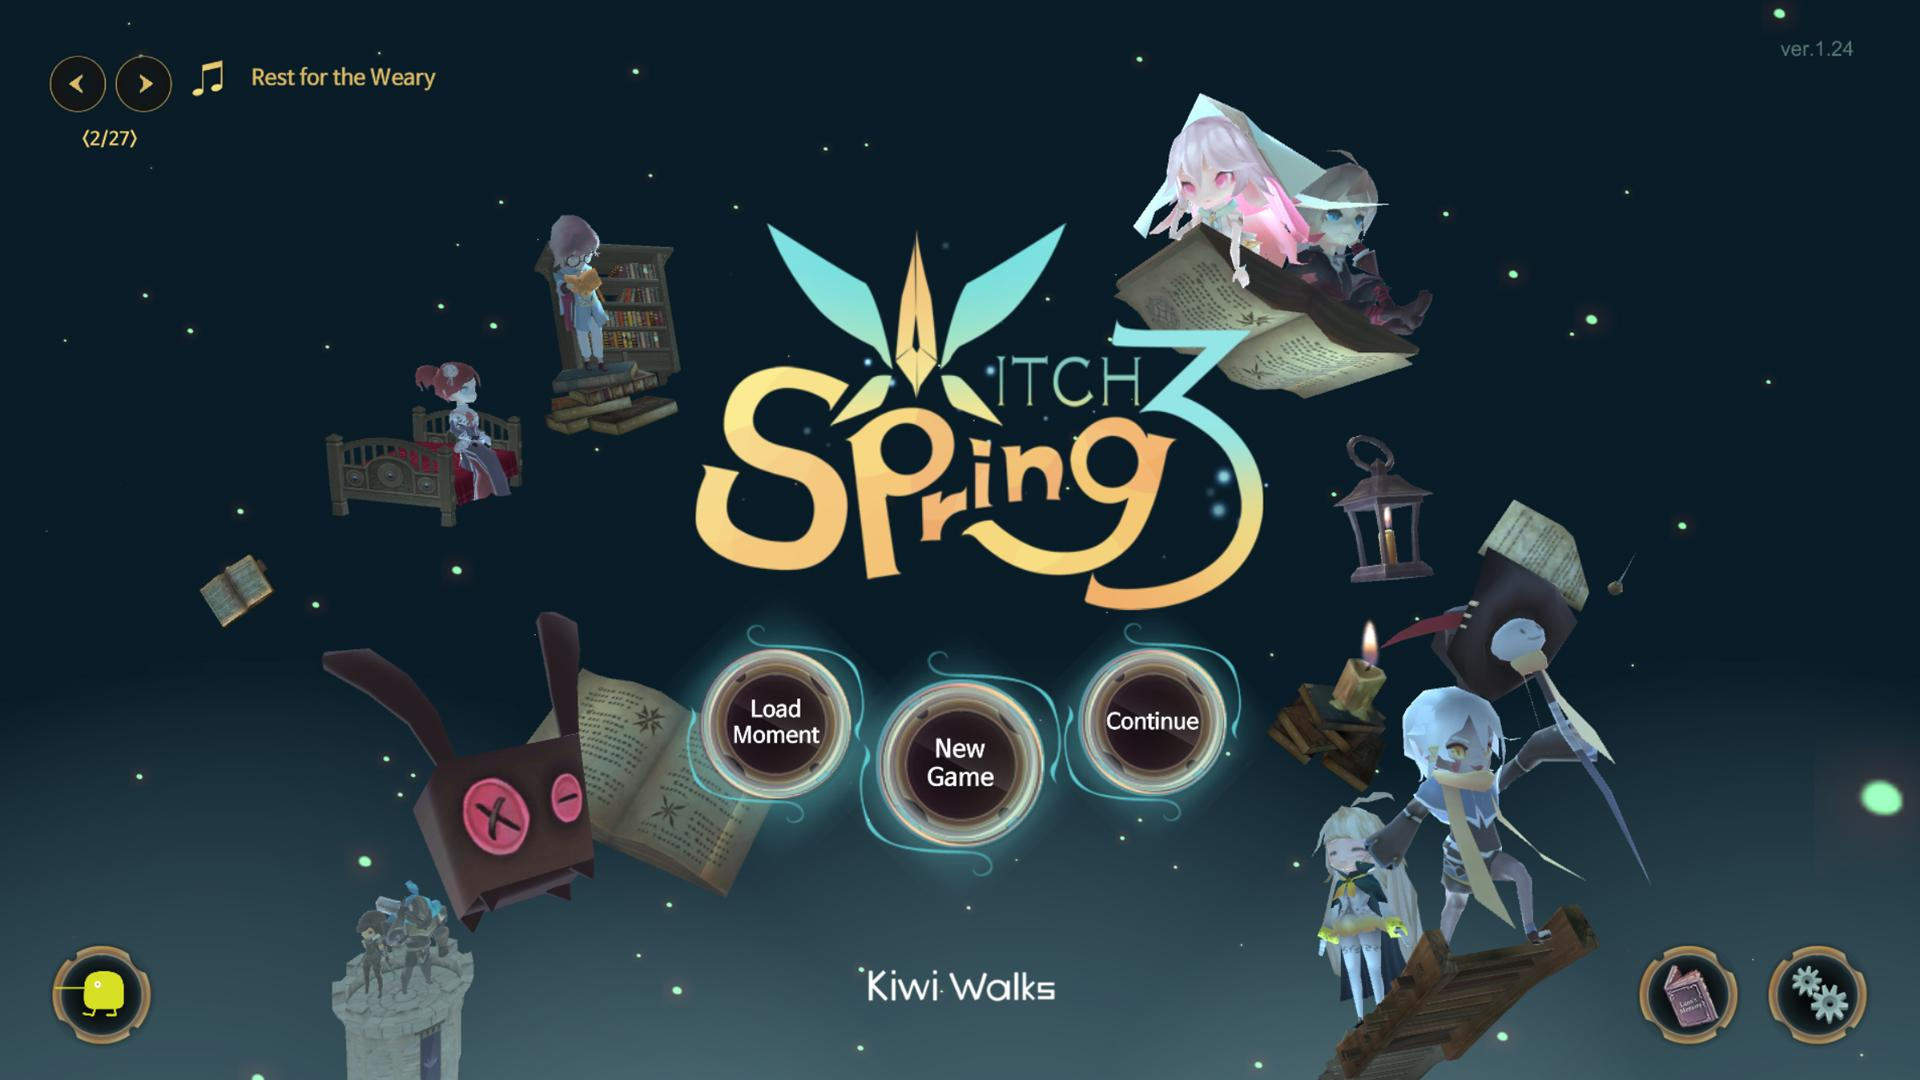 WitchSpring3 screenshot 1